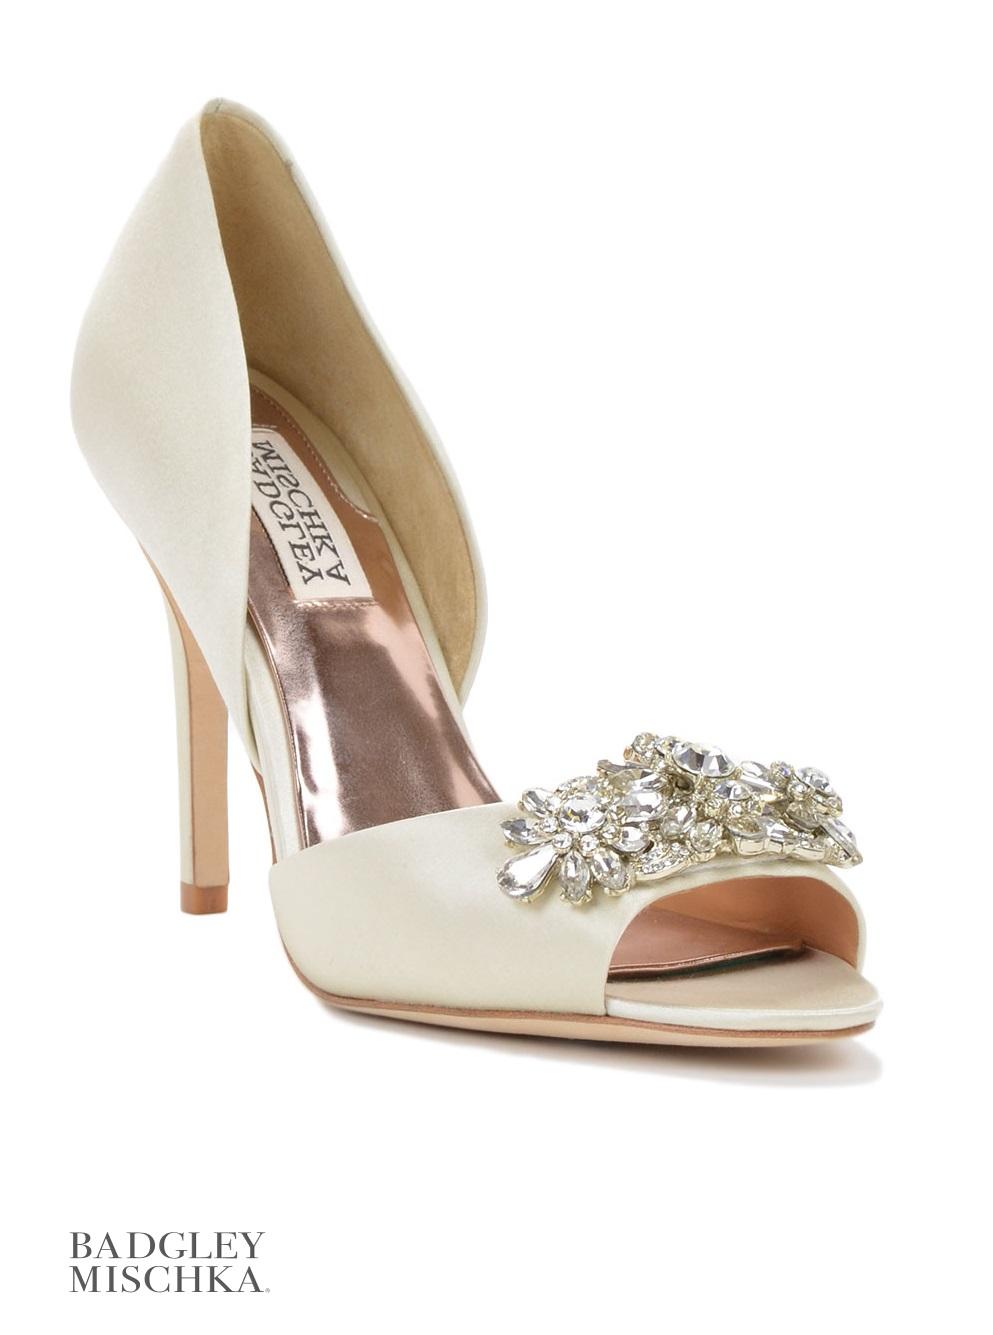 Badgley Mischka4 - Sapatos de princesa